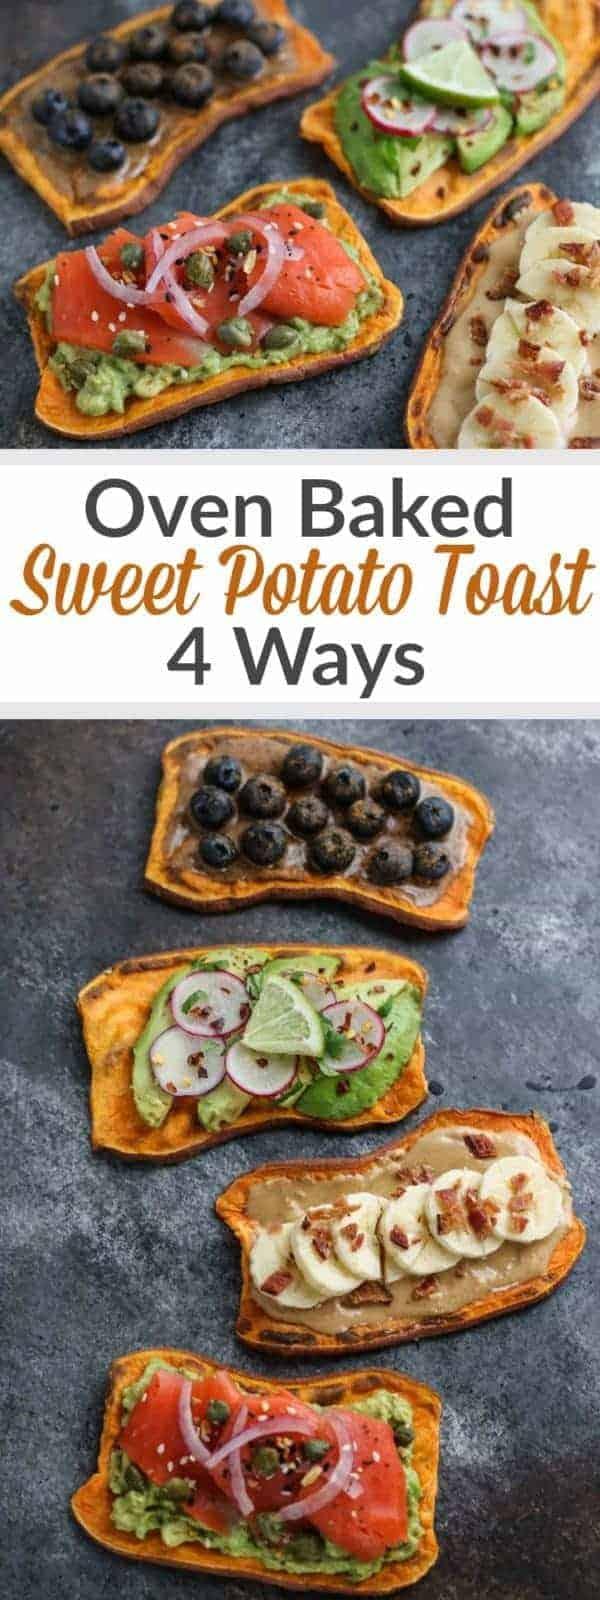 Pinterest image for Oven Baked Sweet Potato Toast - 4 Ways